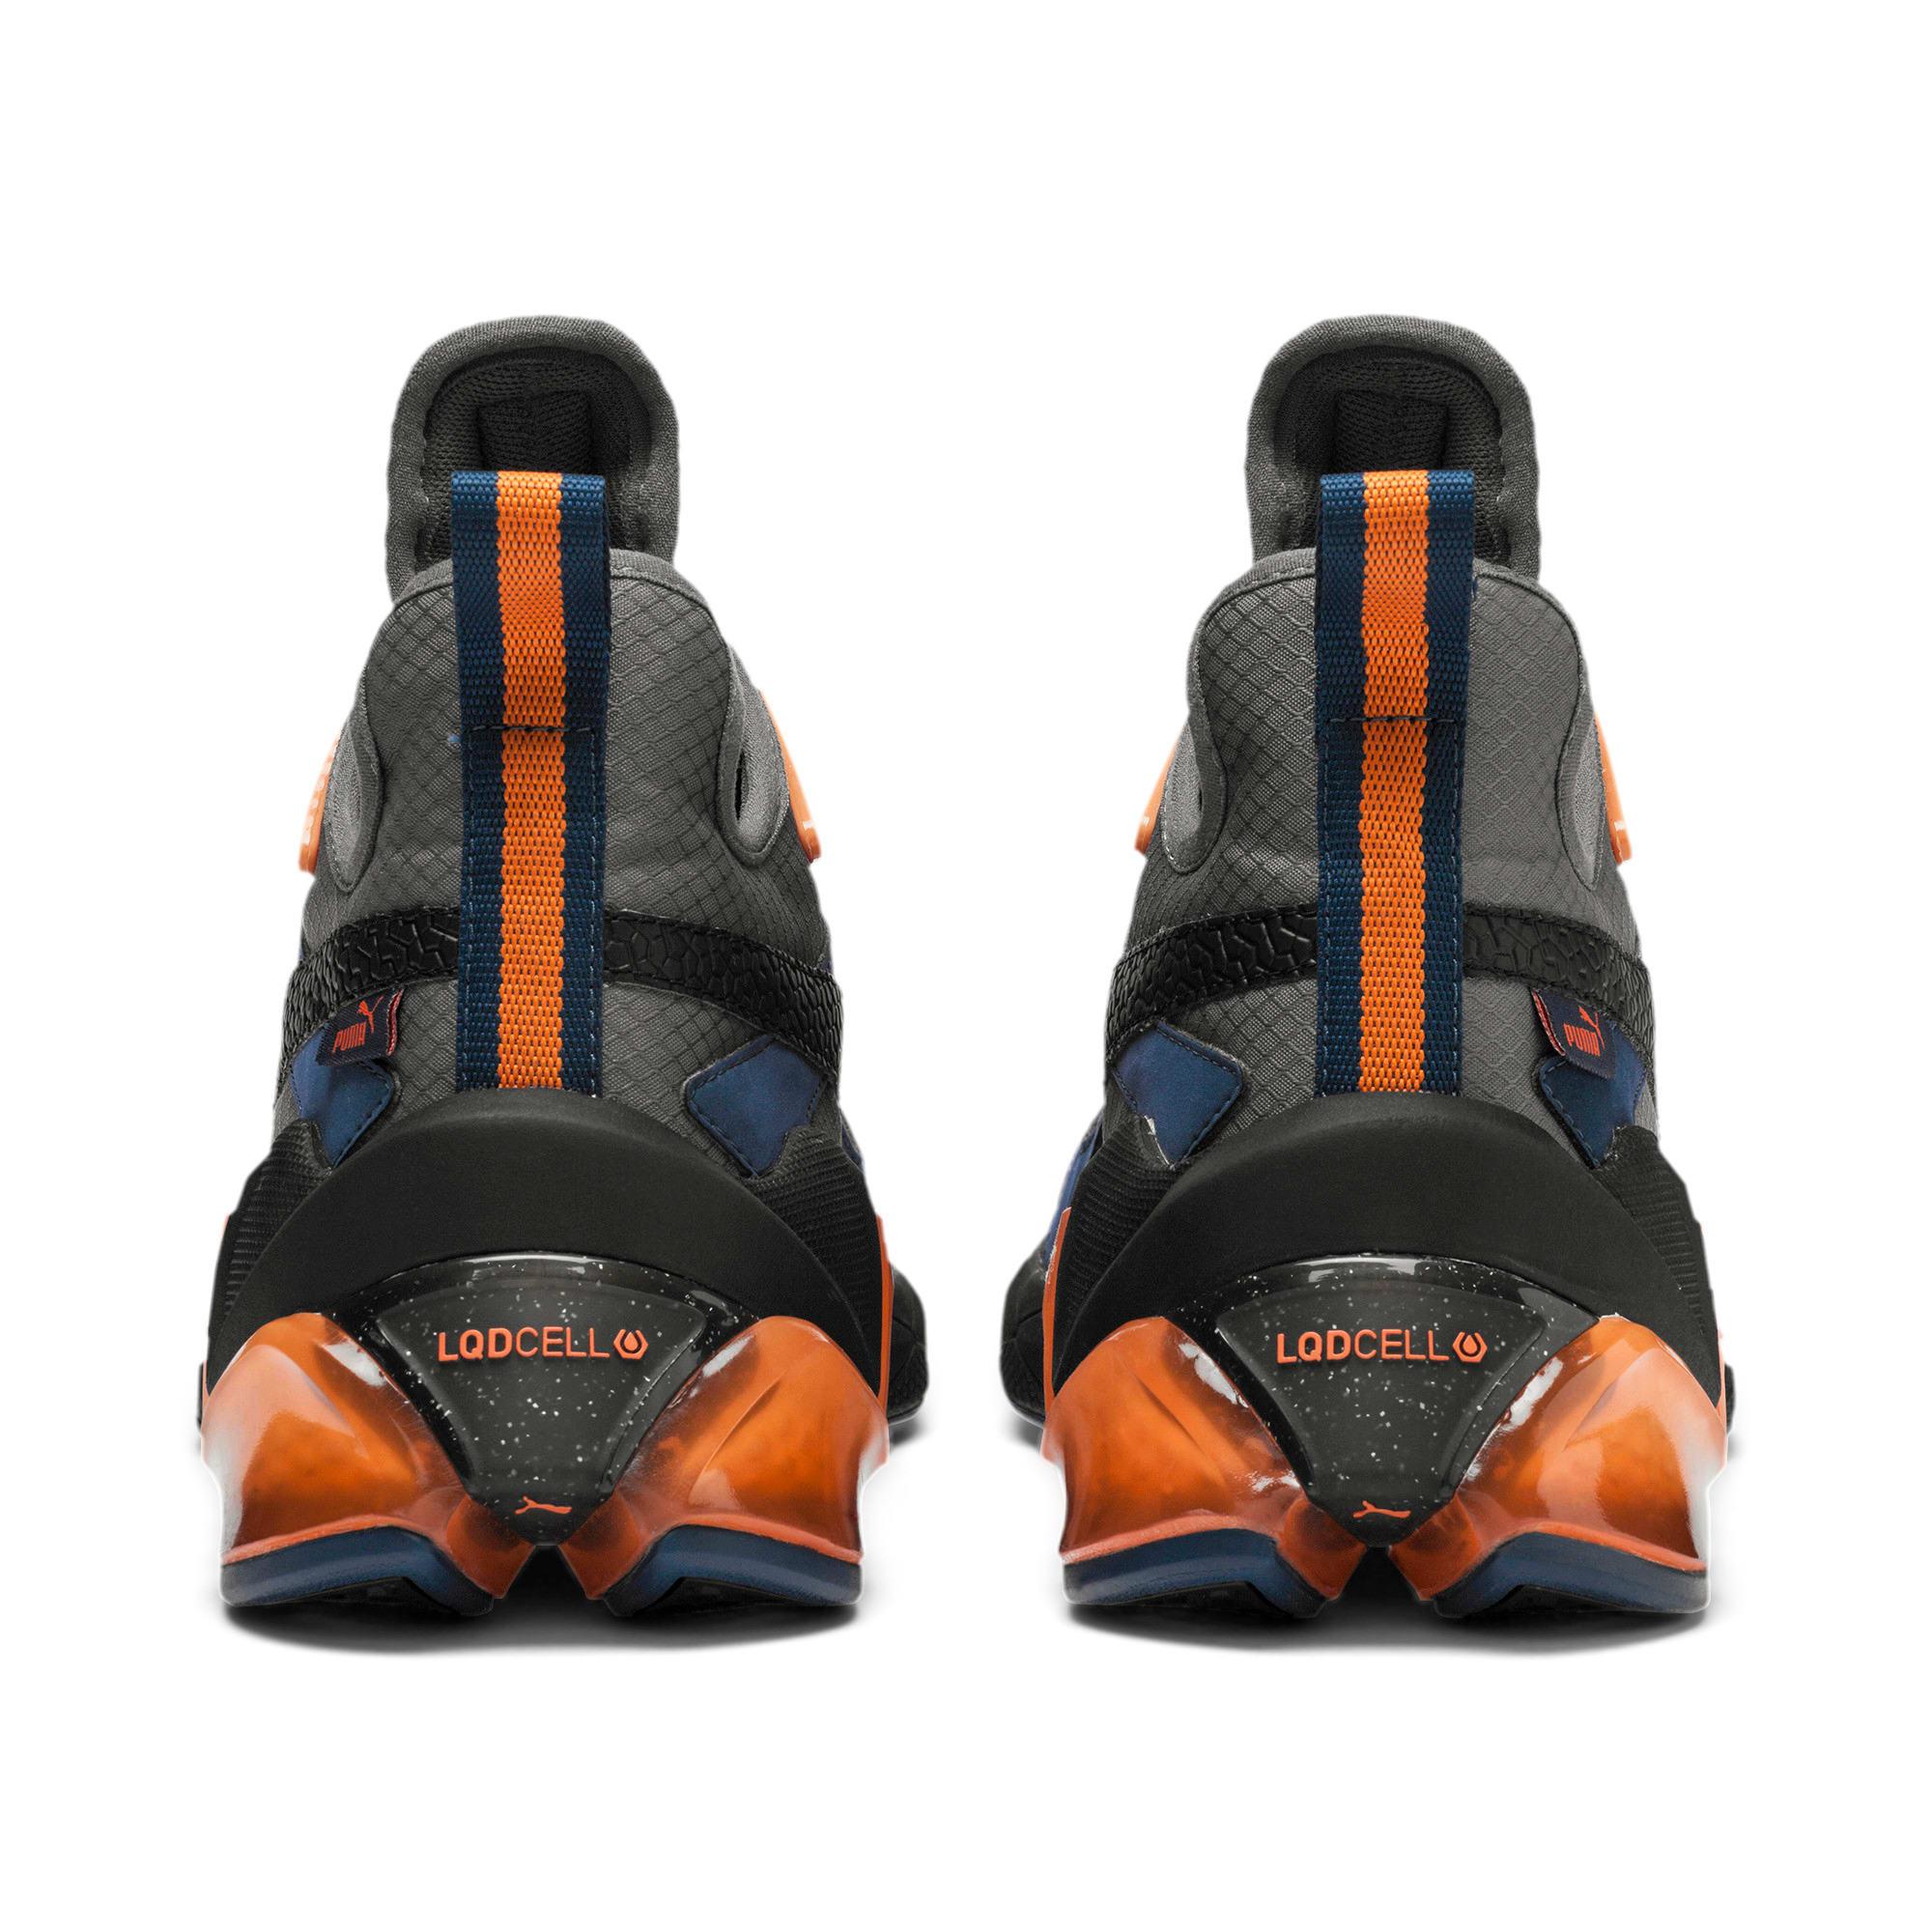 Thumbnail 4 of LQDCELL Origin Terrain Men's Shoes, CASTLEROCK-Puma Black, medium